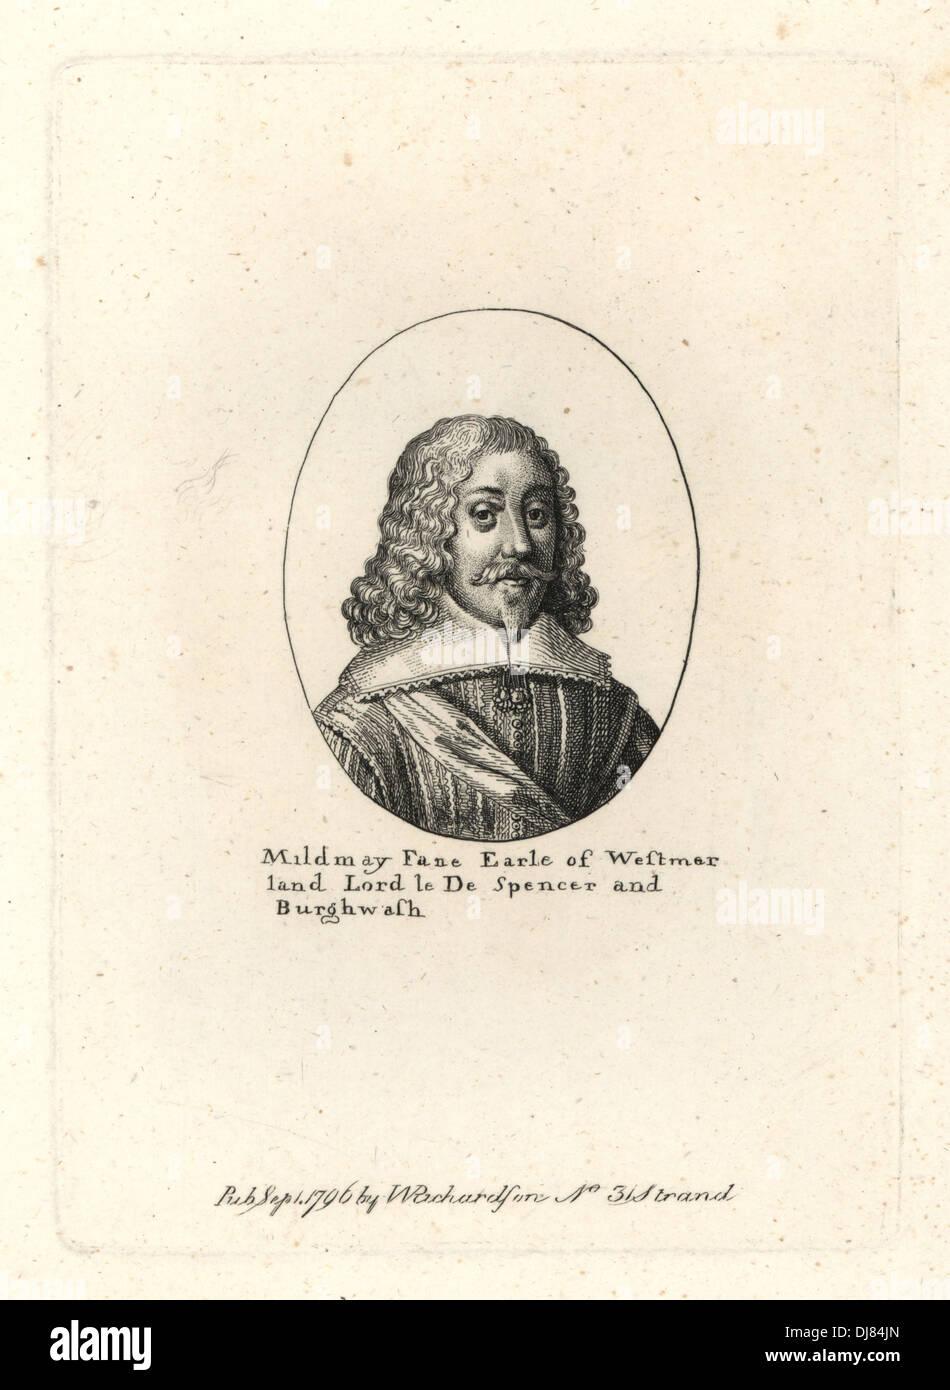 Mildmay Fane, Earl of Westmoreland, gestorben 1665. Stockfoto